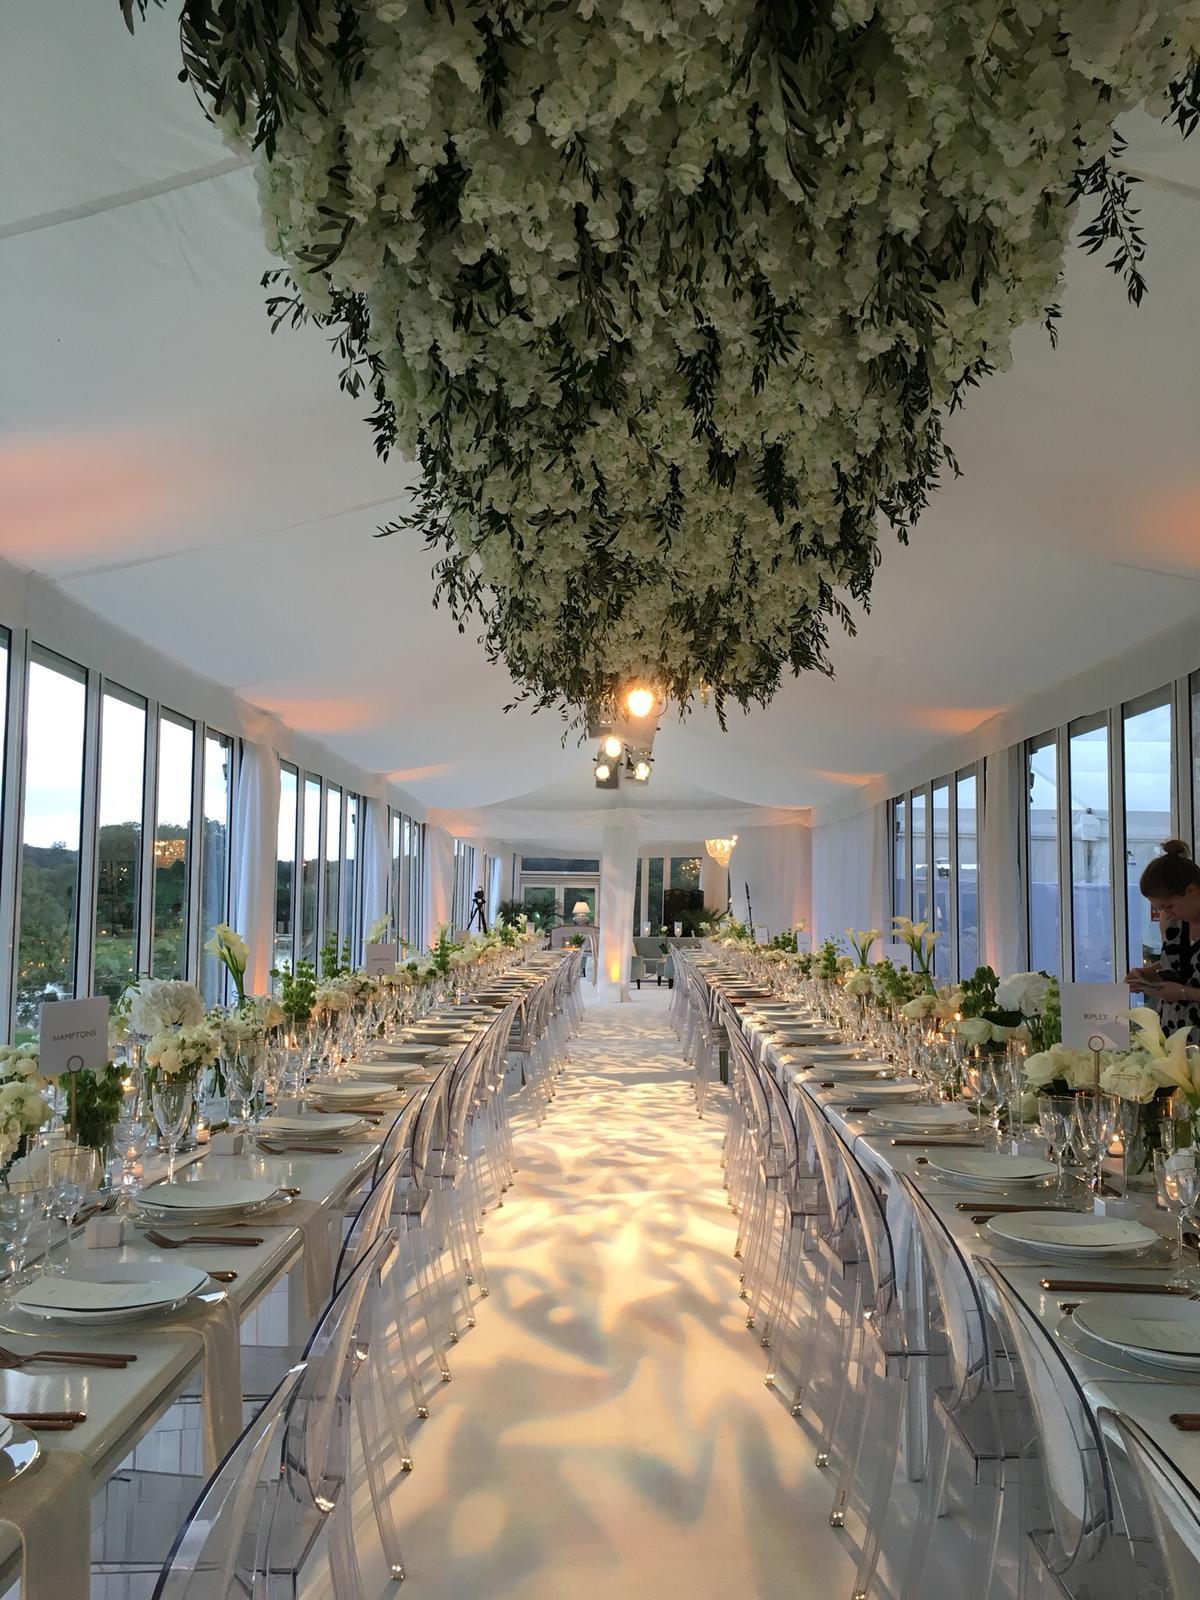 A Yorkshire fairytale wedding